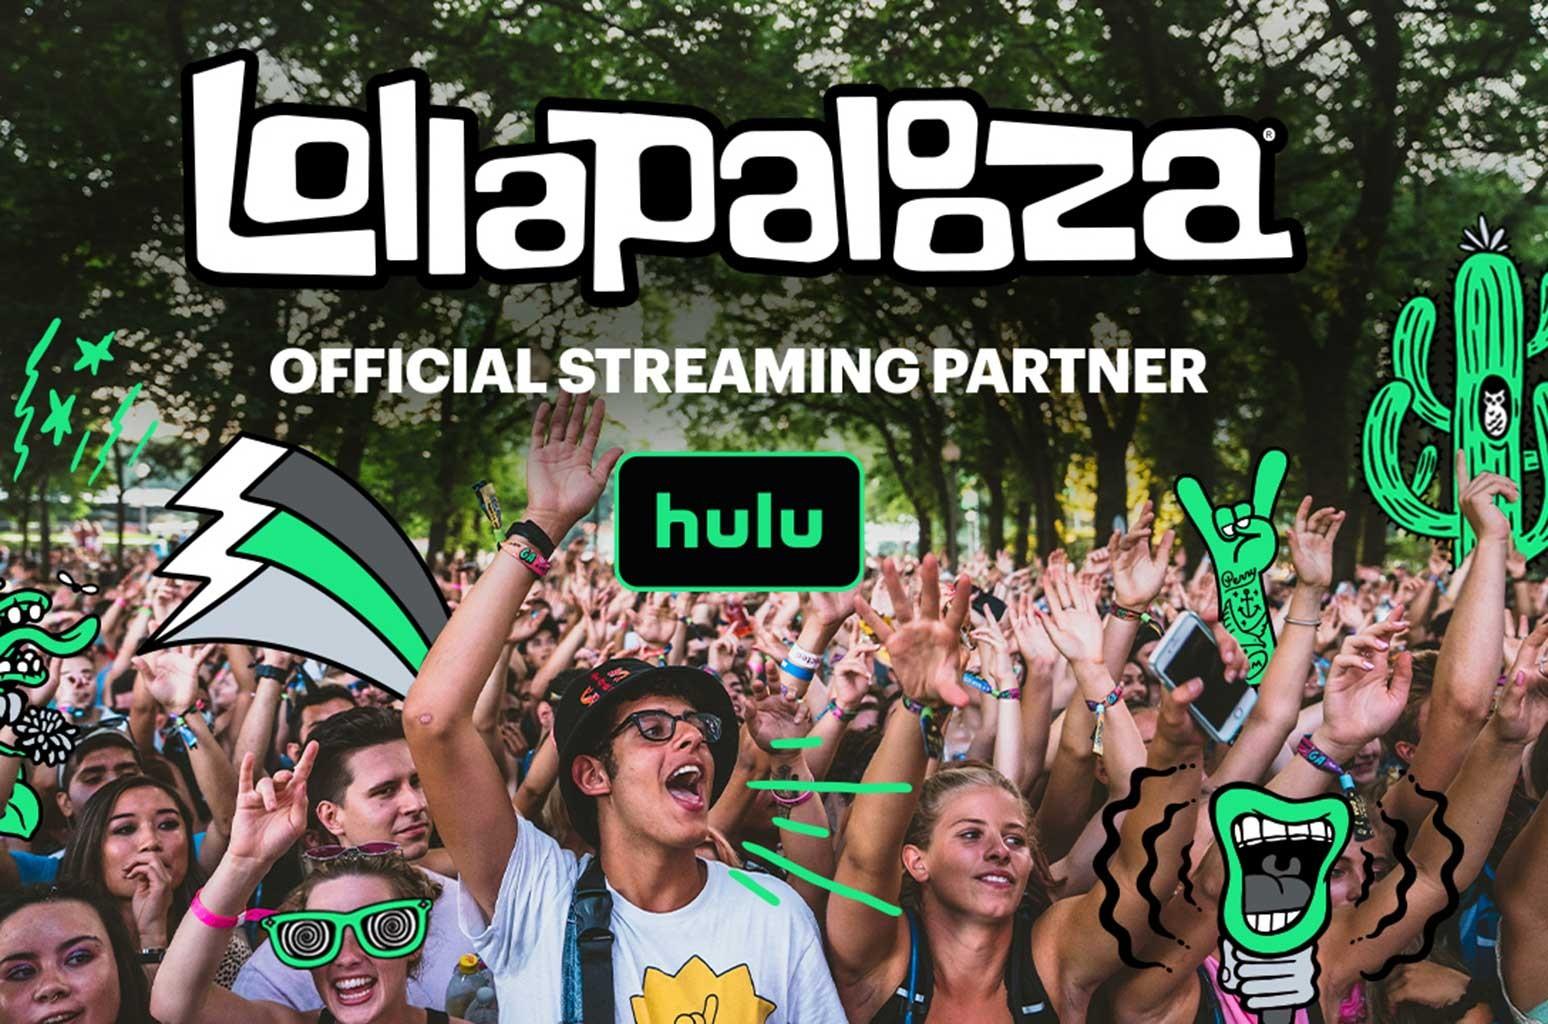 Lollapalooza 2021 streaming via Hulu